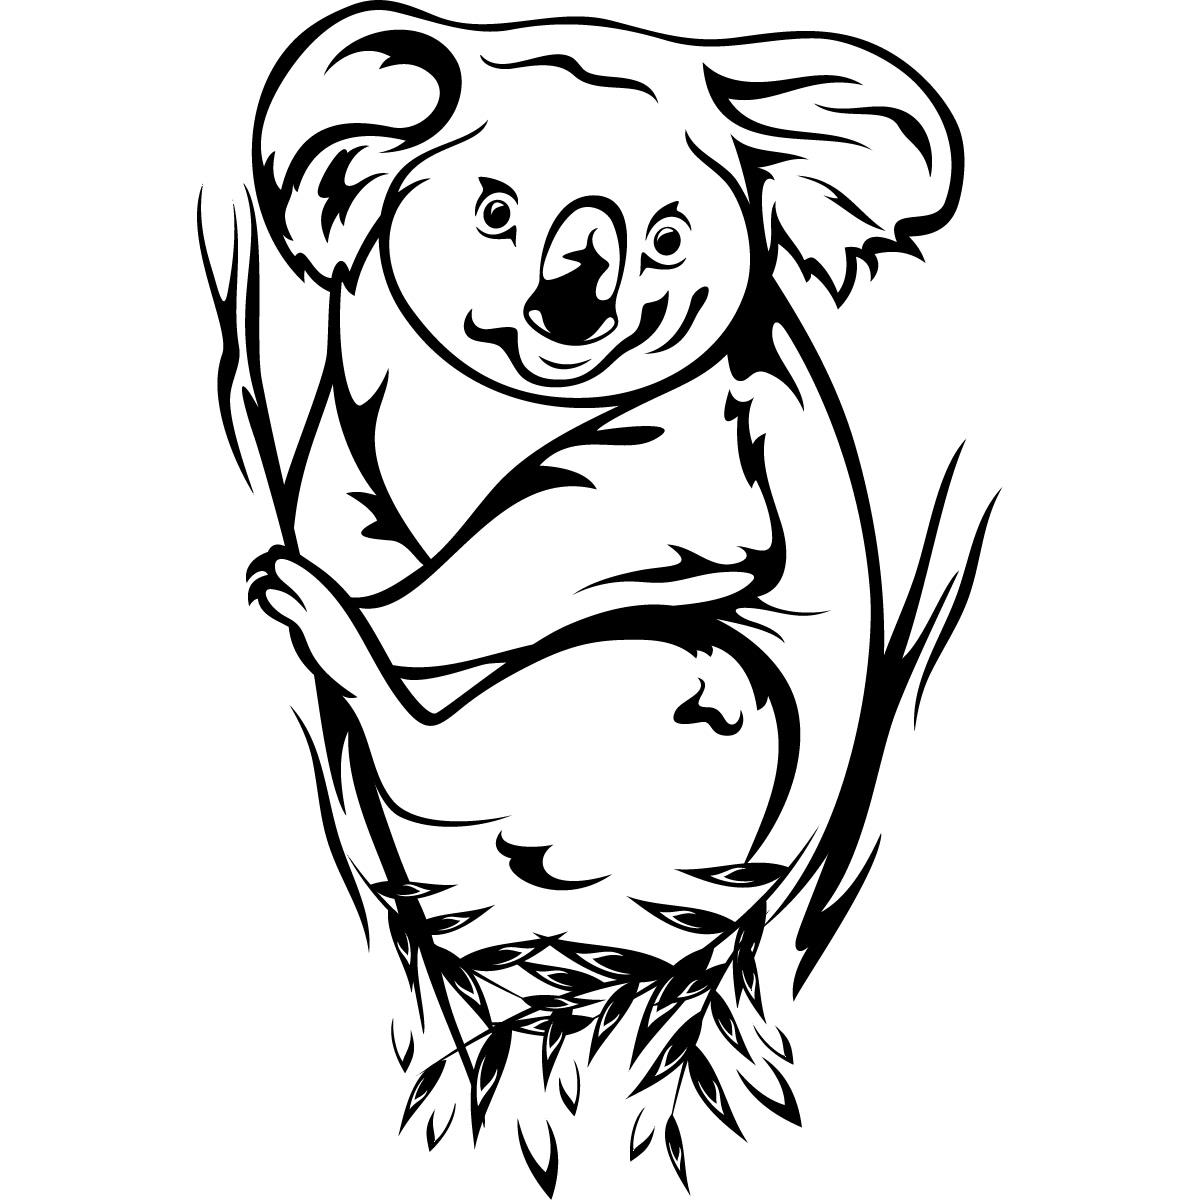 Line Drawing Koala : Koala clipart black and white panda free